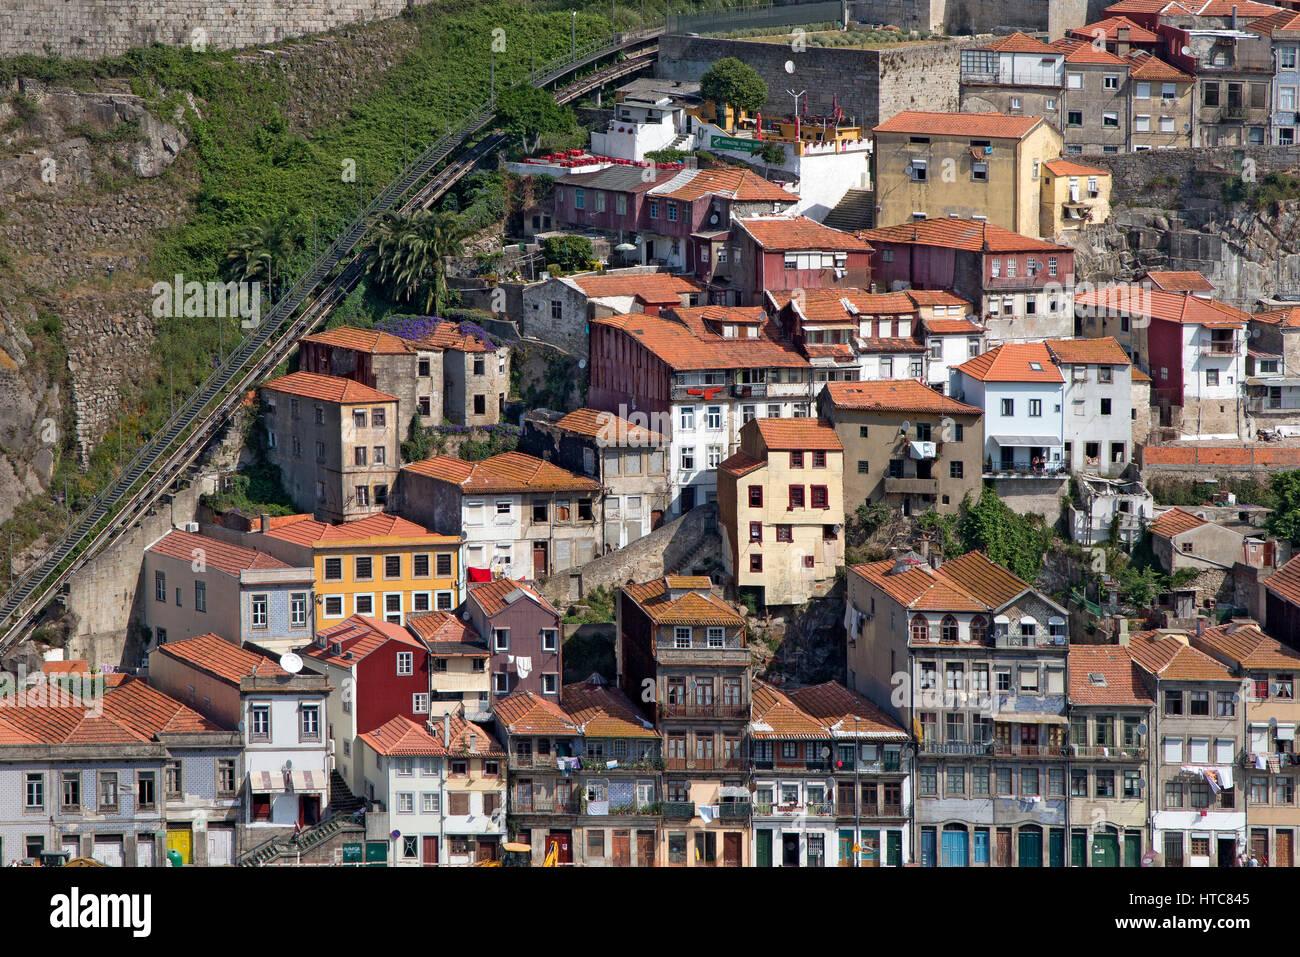 Houses of Porto near Douro River Portugal - Stock Image